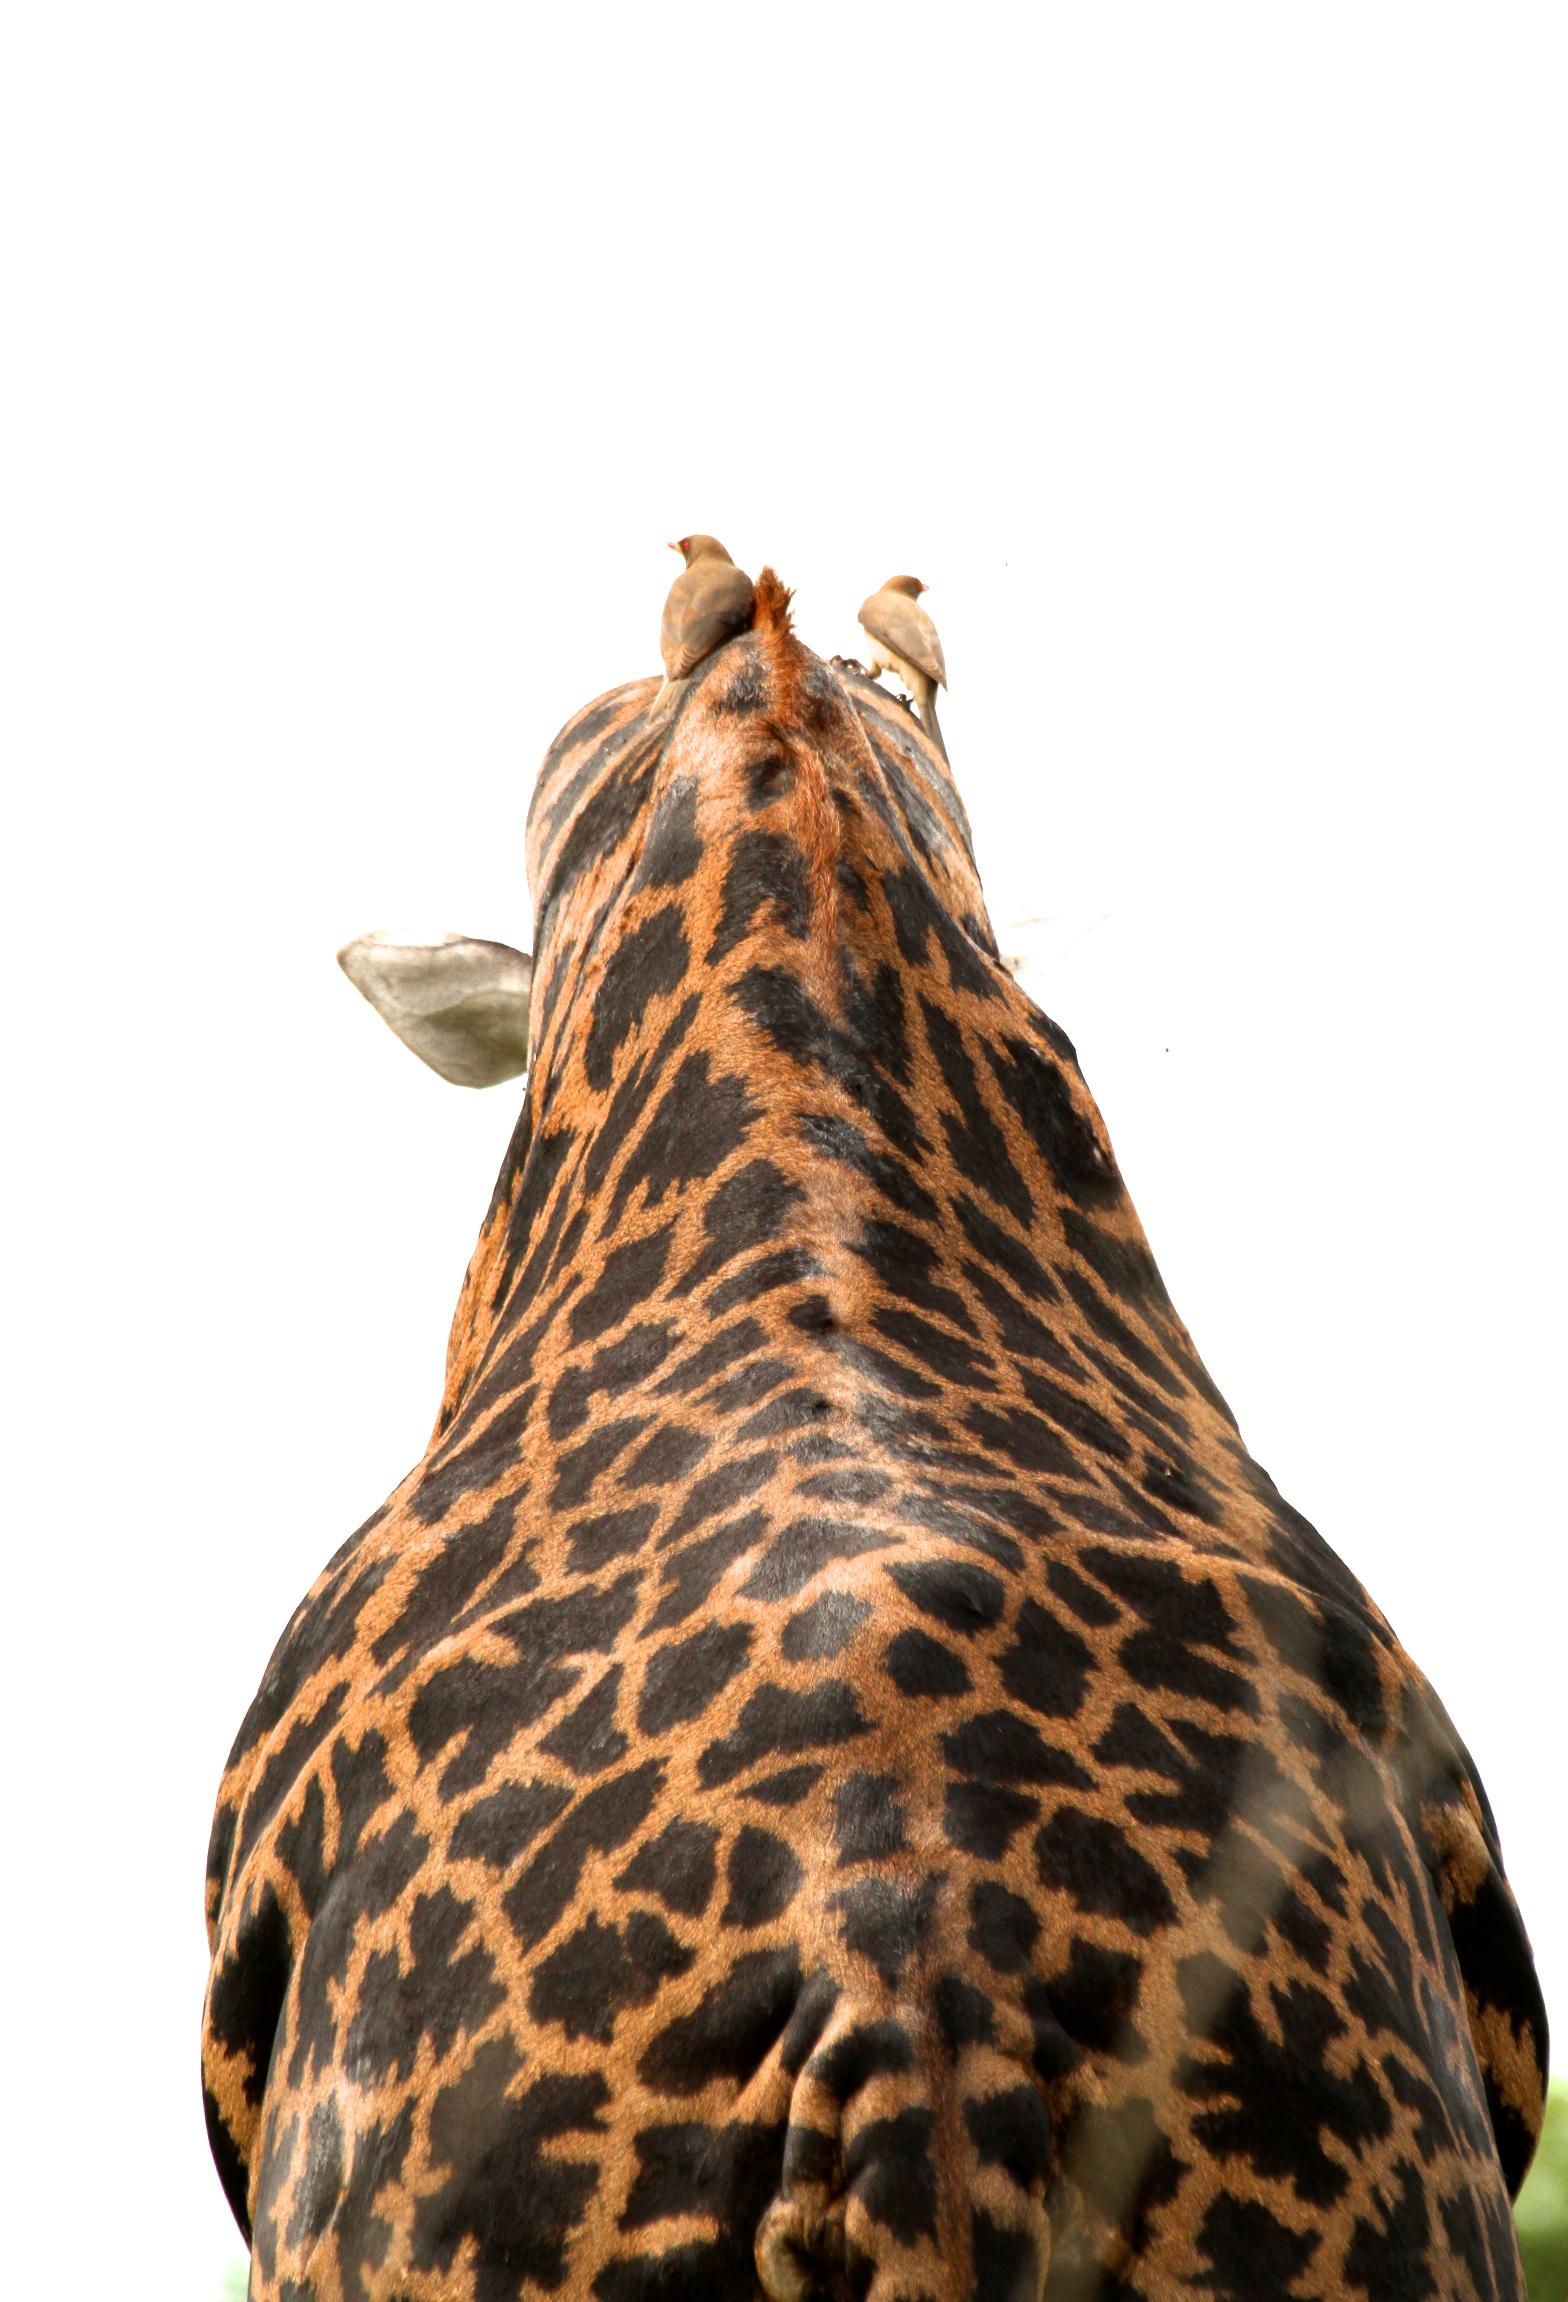 Giraffe with Tickbirds